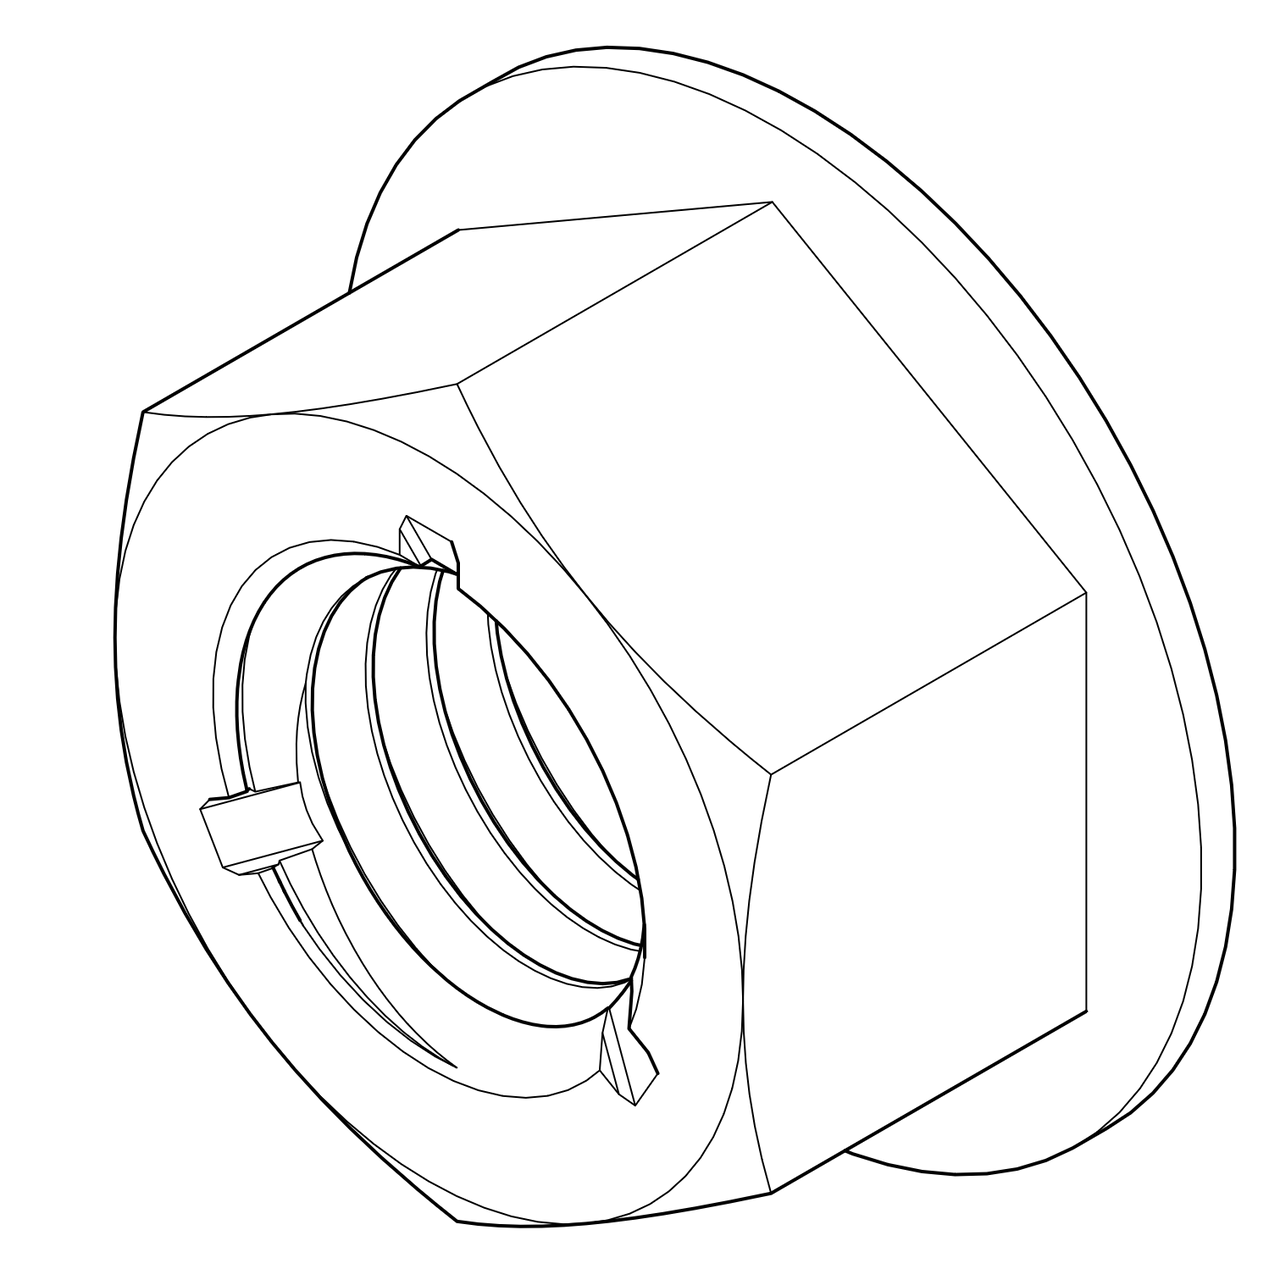 N58FLN (785600)